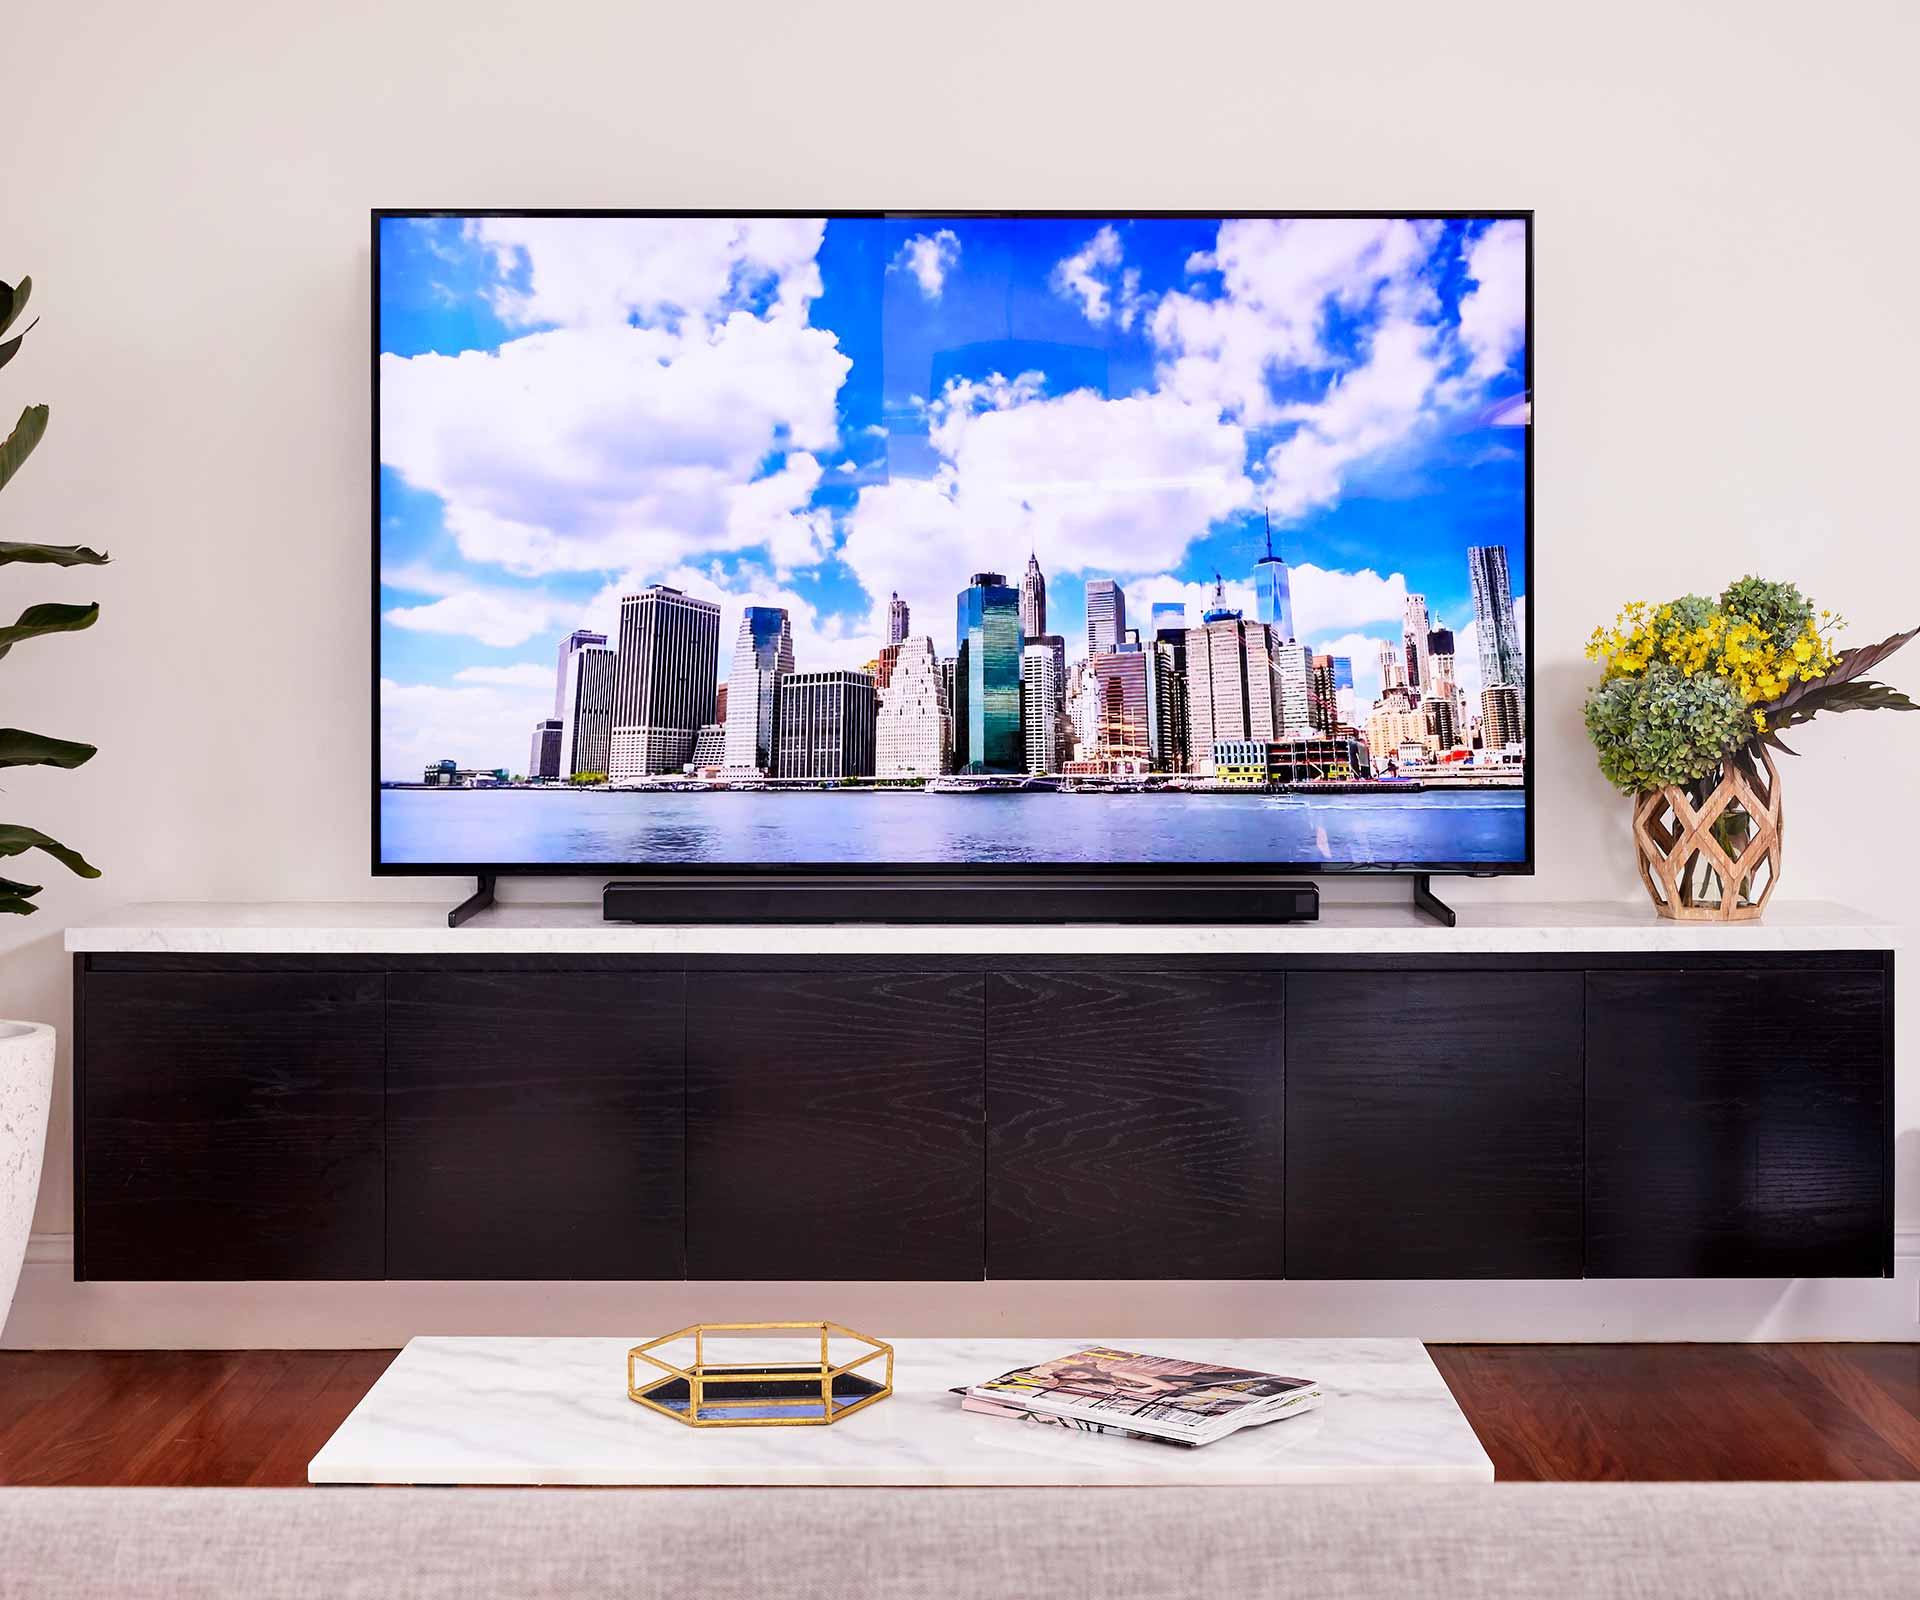 8K TVs Australia: Pros, Cons, Brands & Prices